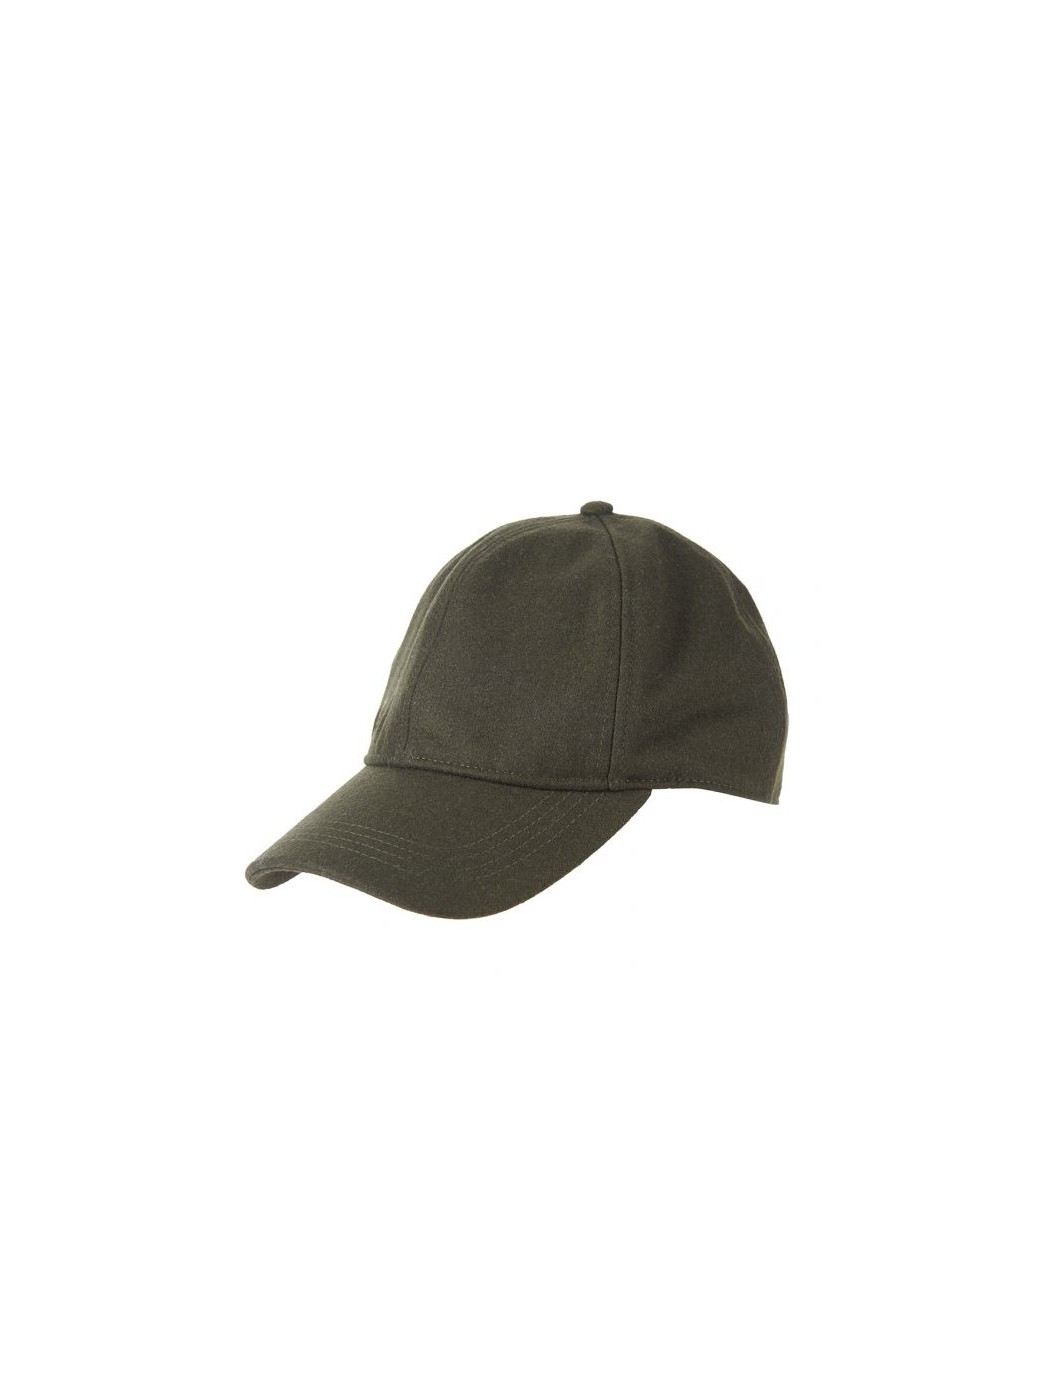 COOPWORTH SPORT CAP BARBOUR MHA0444 SG15